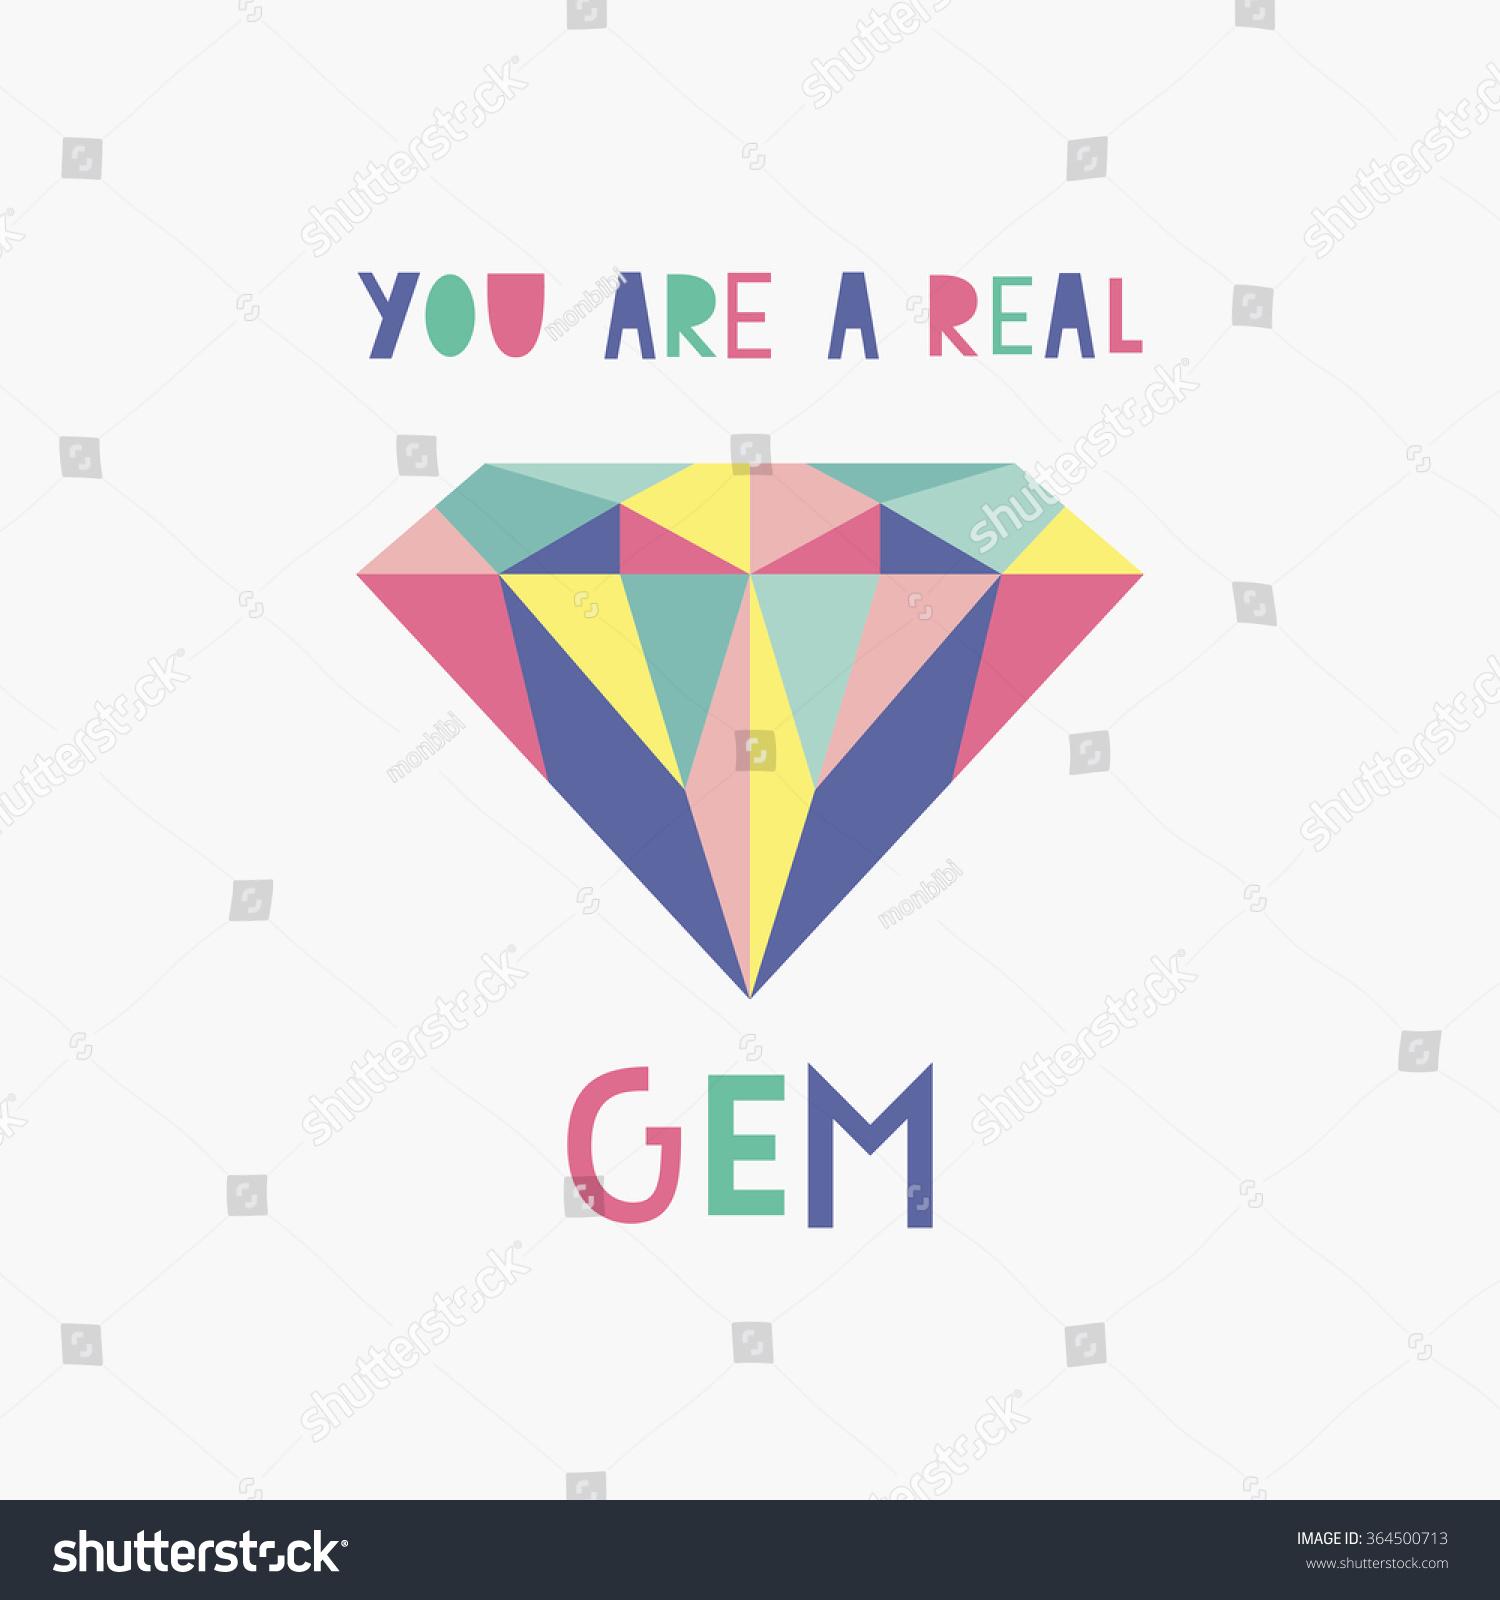 You Gem Card Vector Illustration Stock Vector 364500713